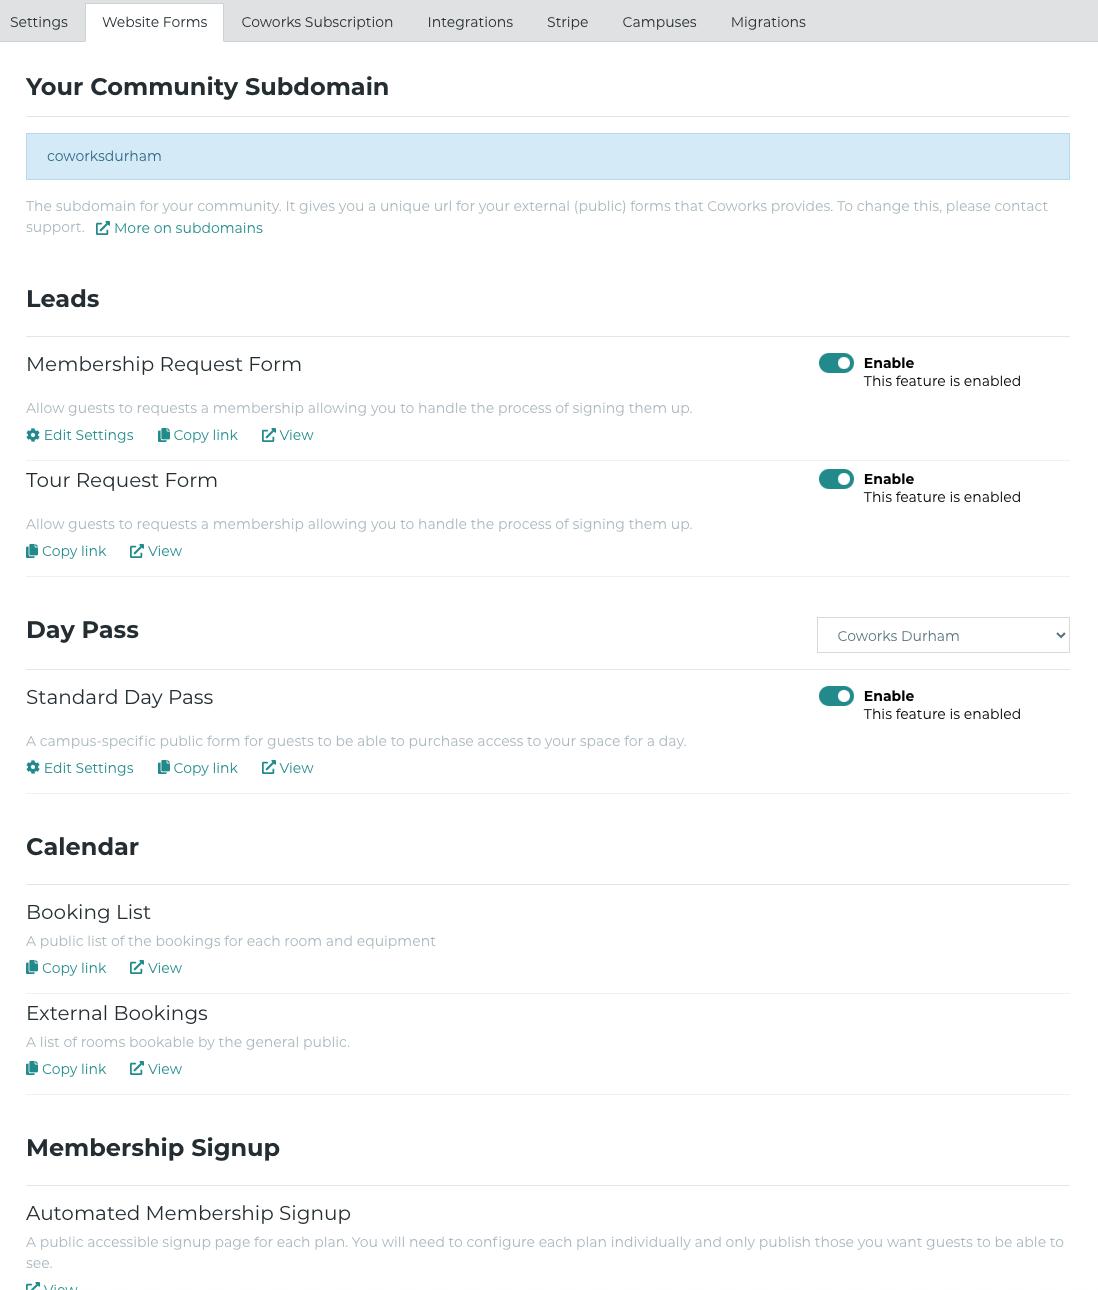 Website Forms